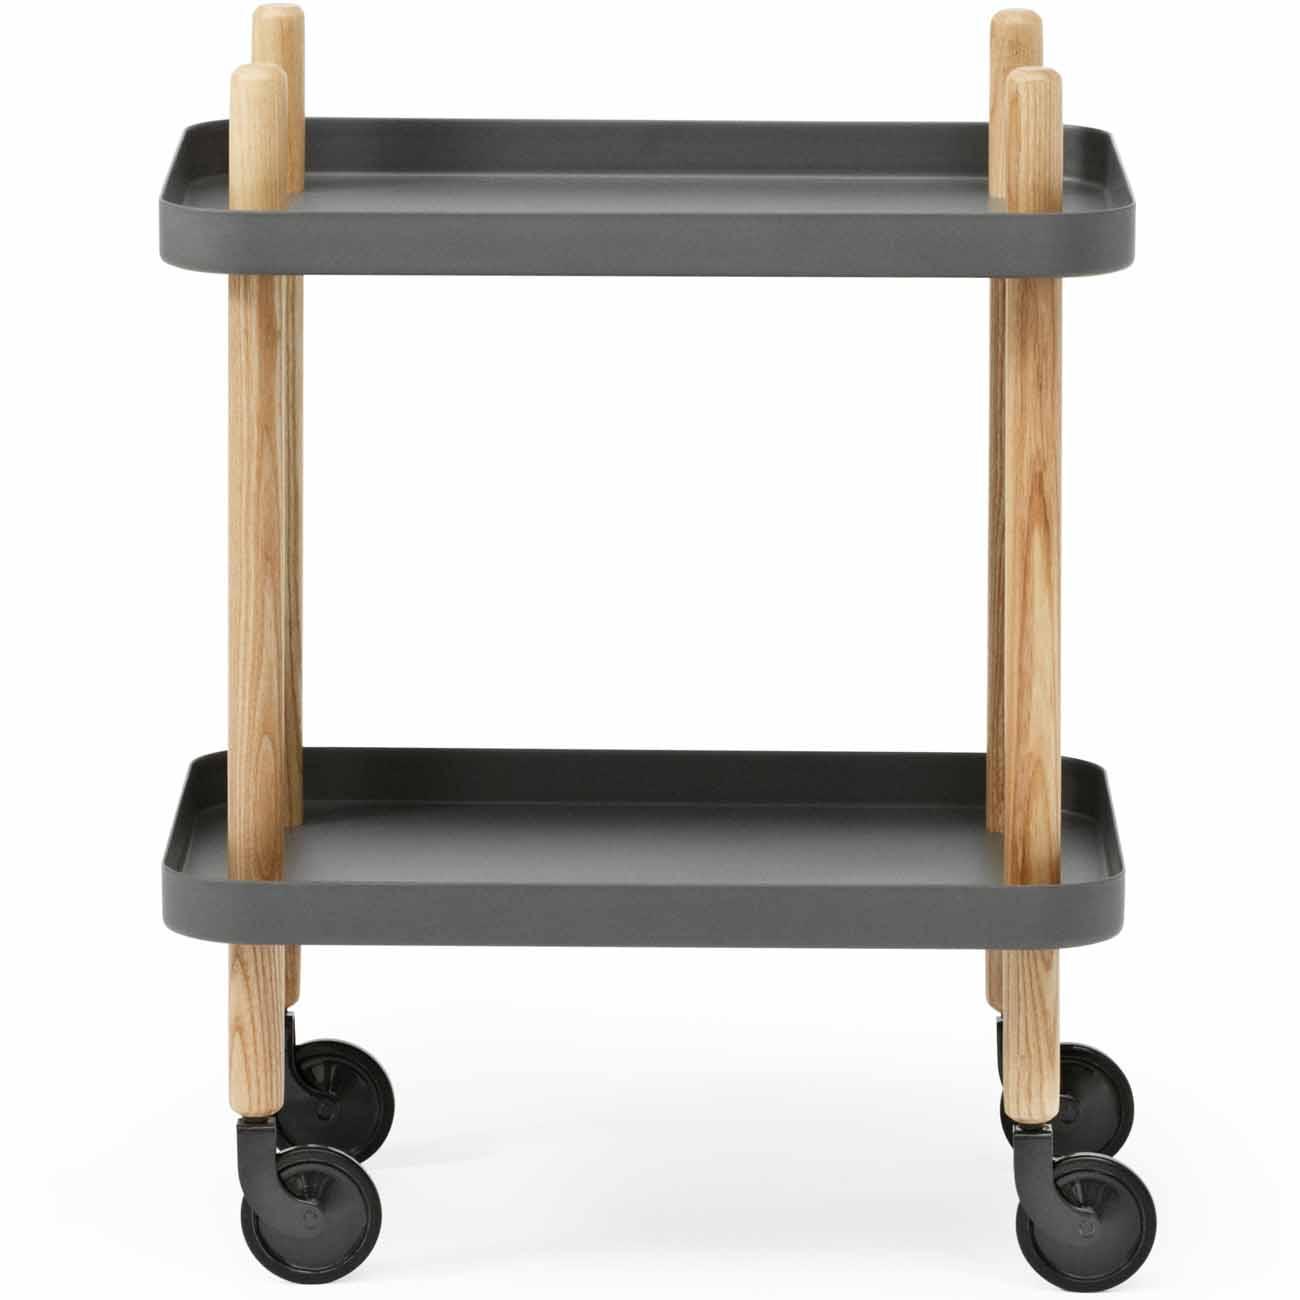 normann copenhagen block tisch dunkelgrau h he 64 cm m bel. Black Bedroom Furniture Sets. Home Design Ideas